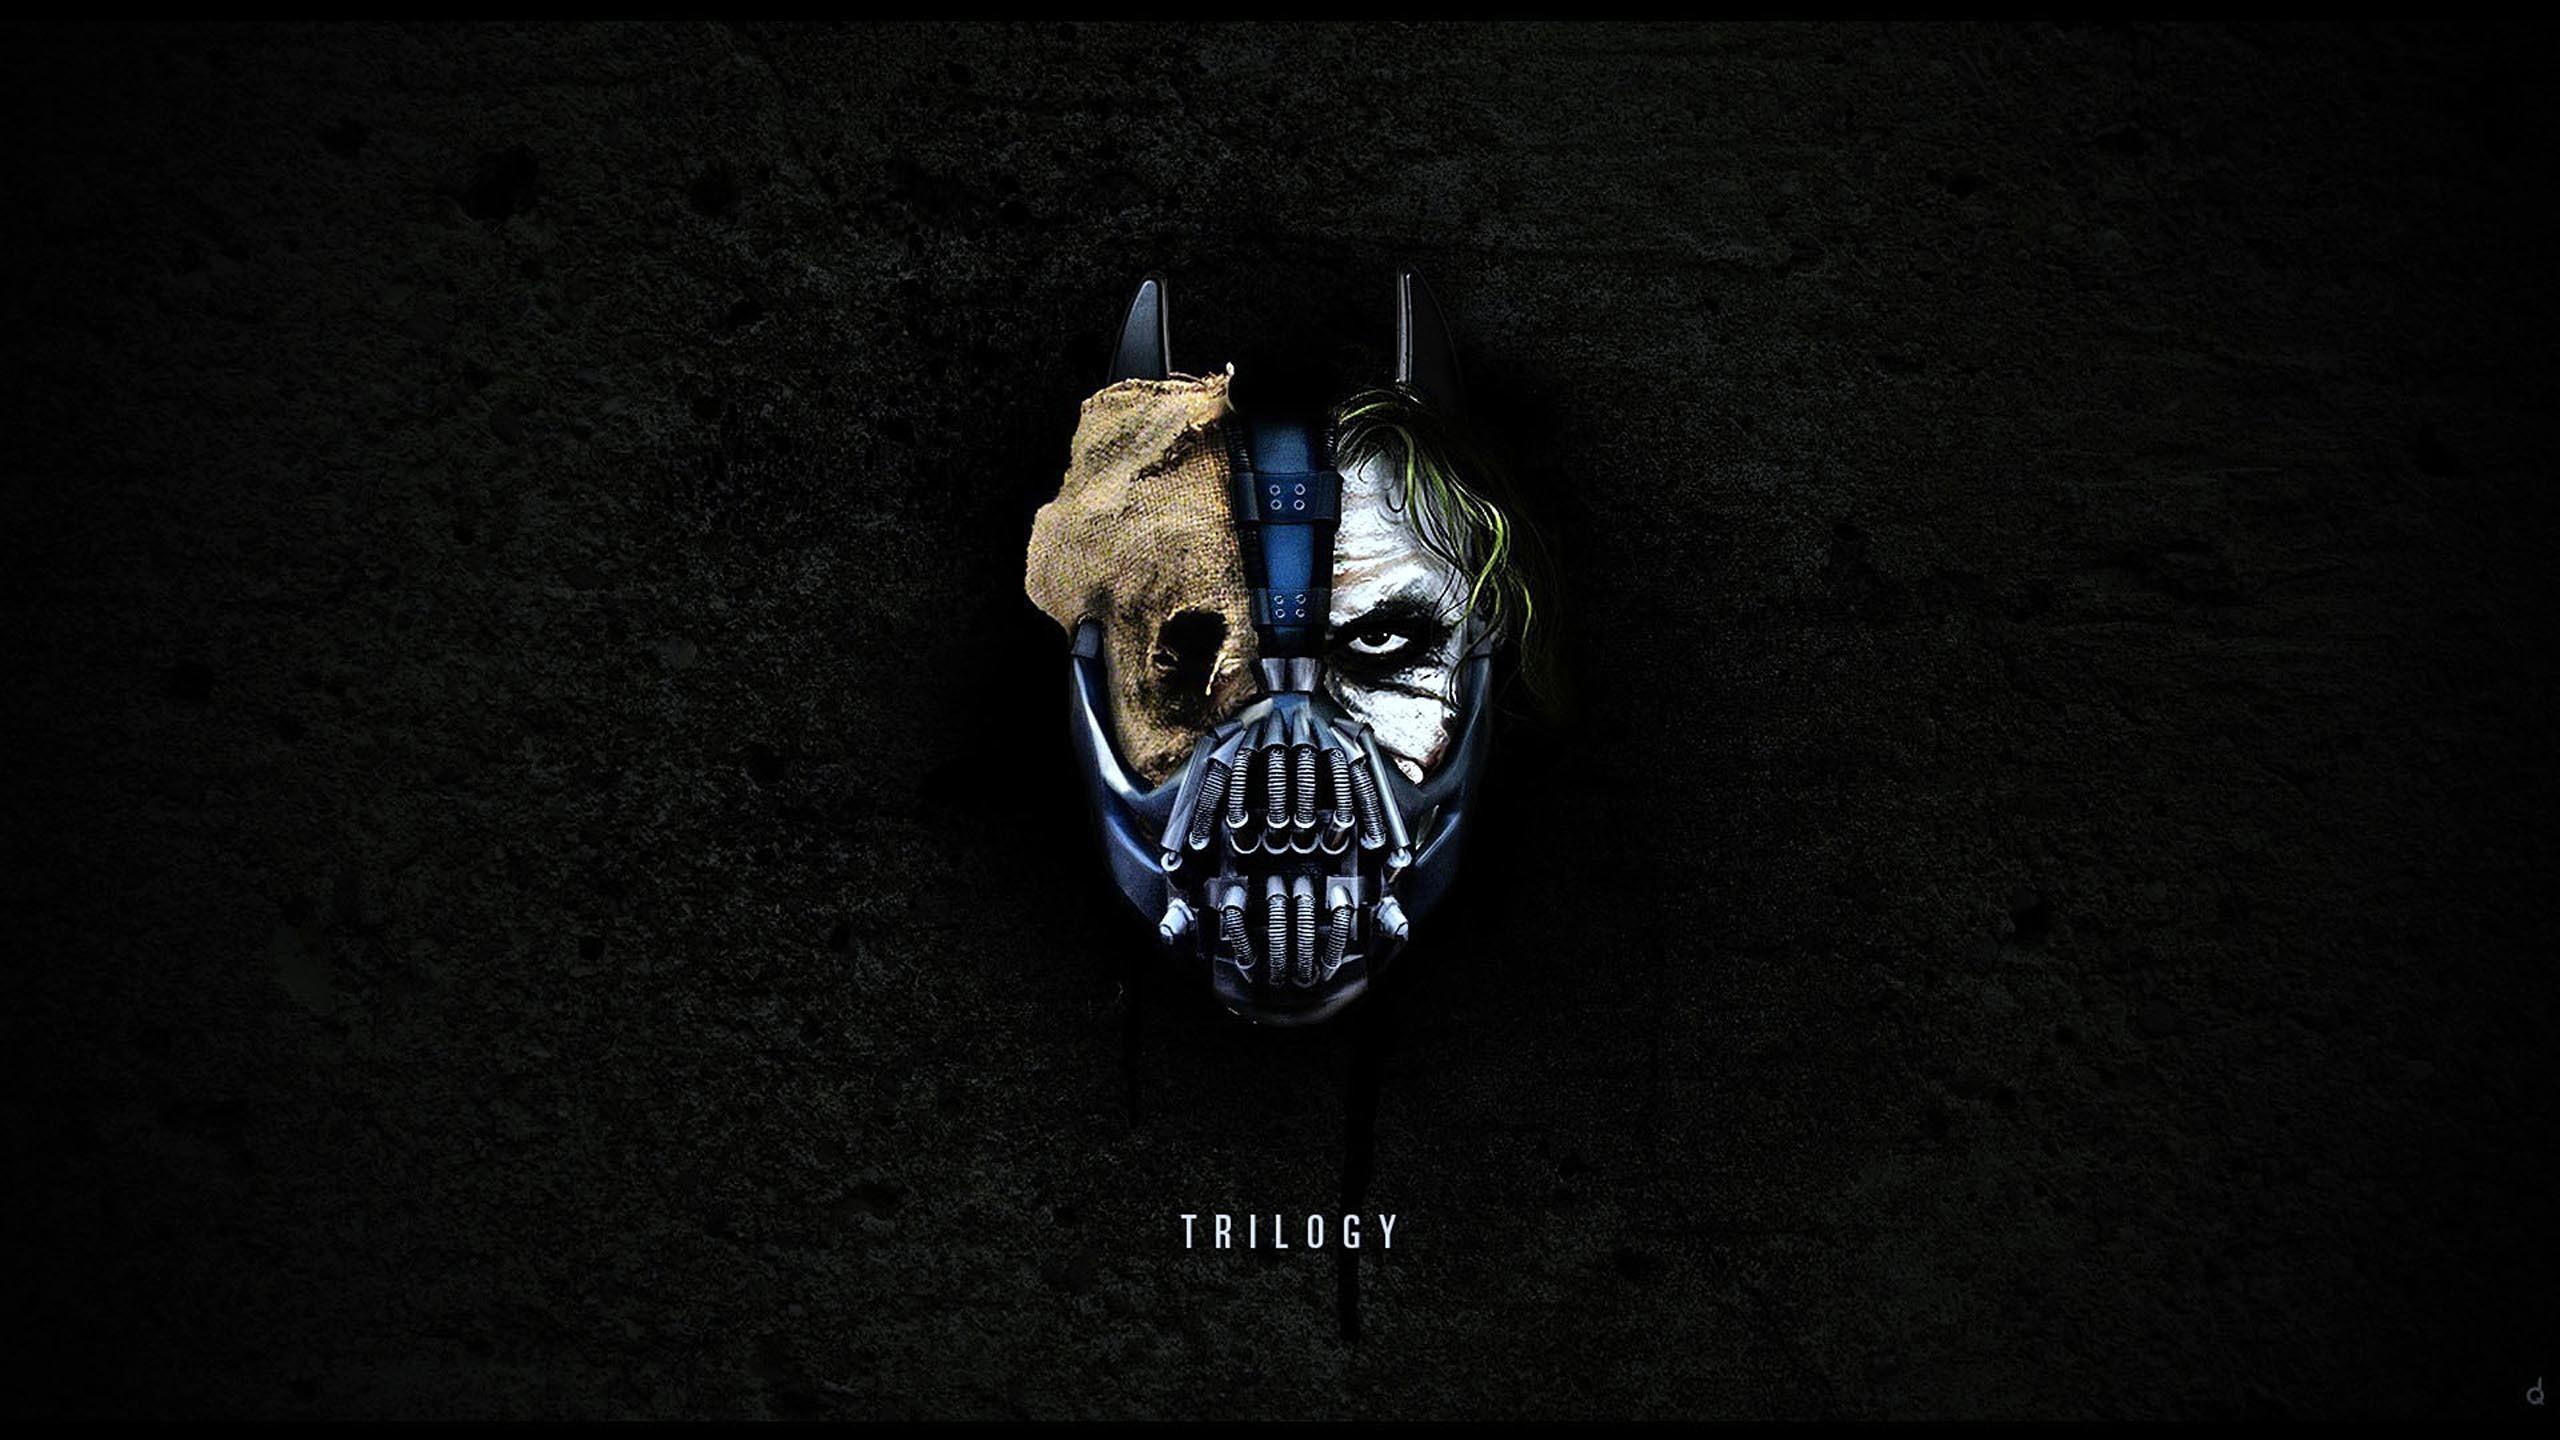 Tags: Mask